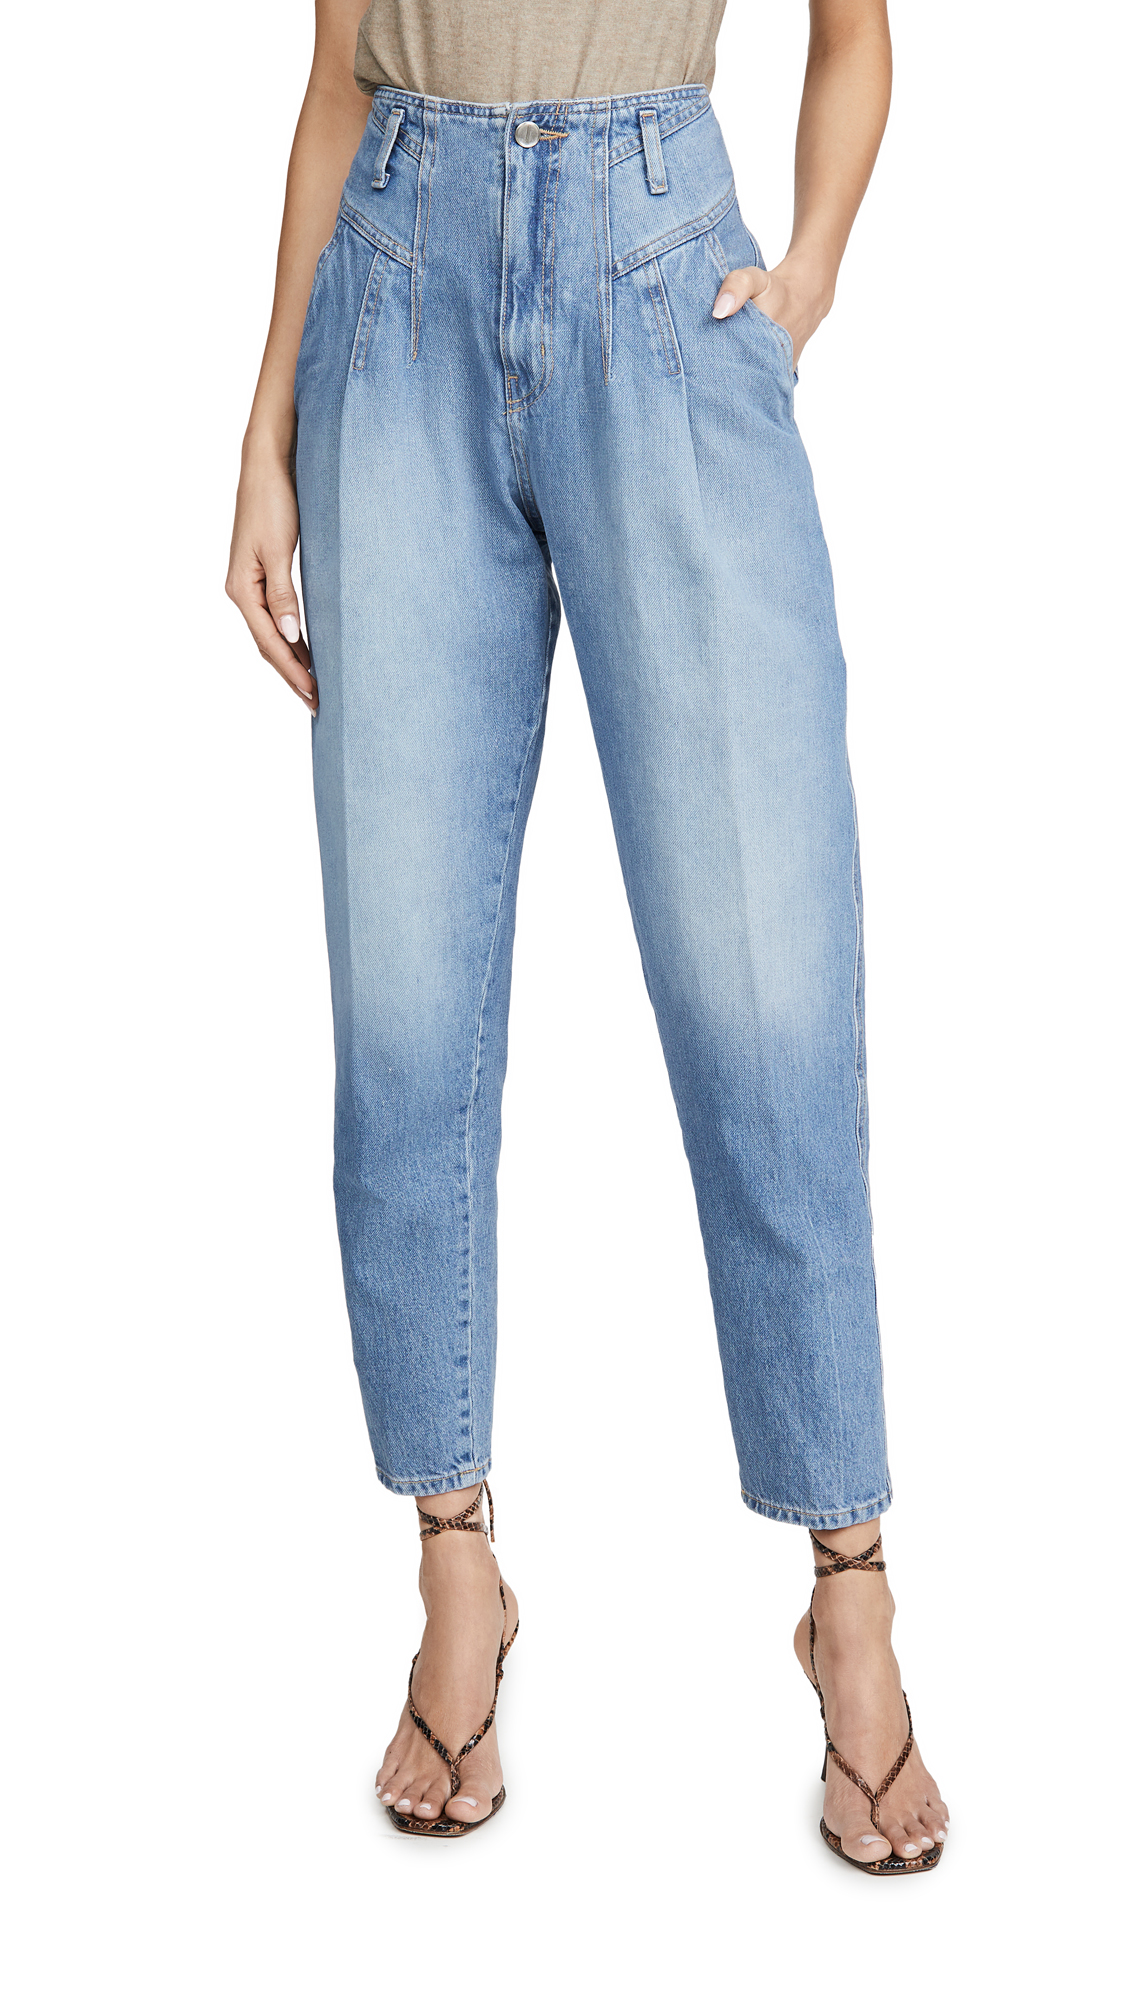 Buy TRE by Natalie Ratabesi online - photo of TRE by Natalie Ratabesi Blue Wash Jeans